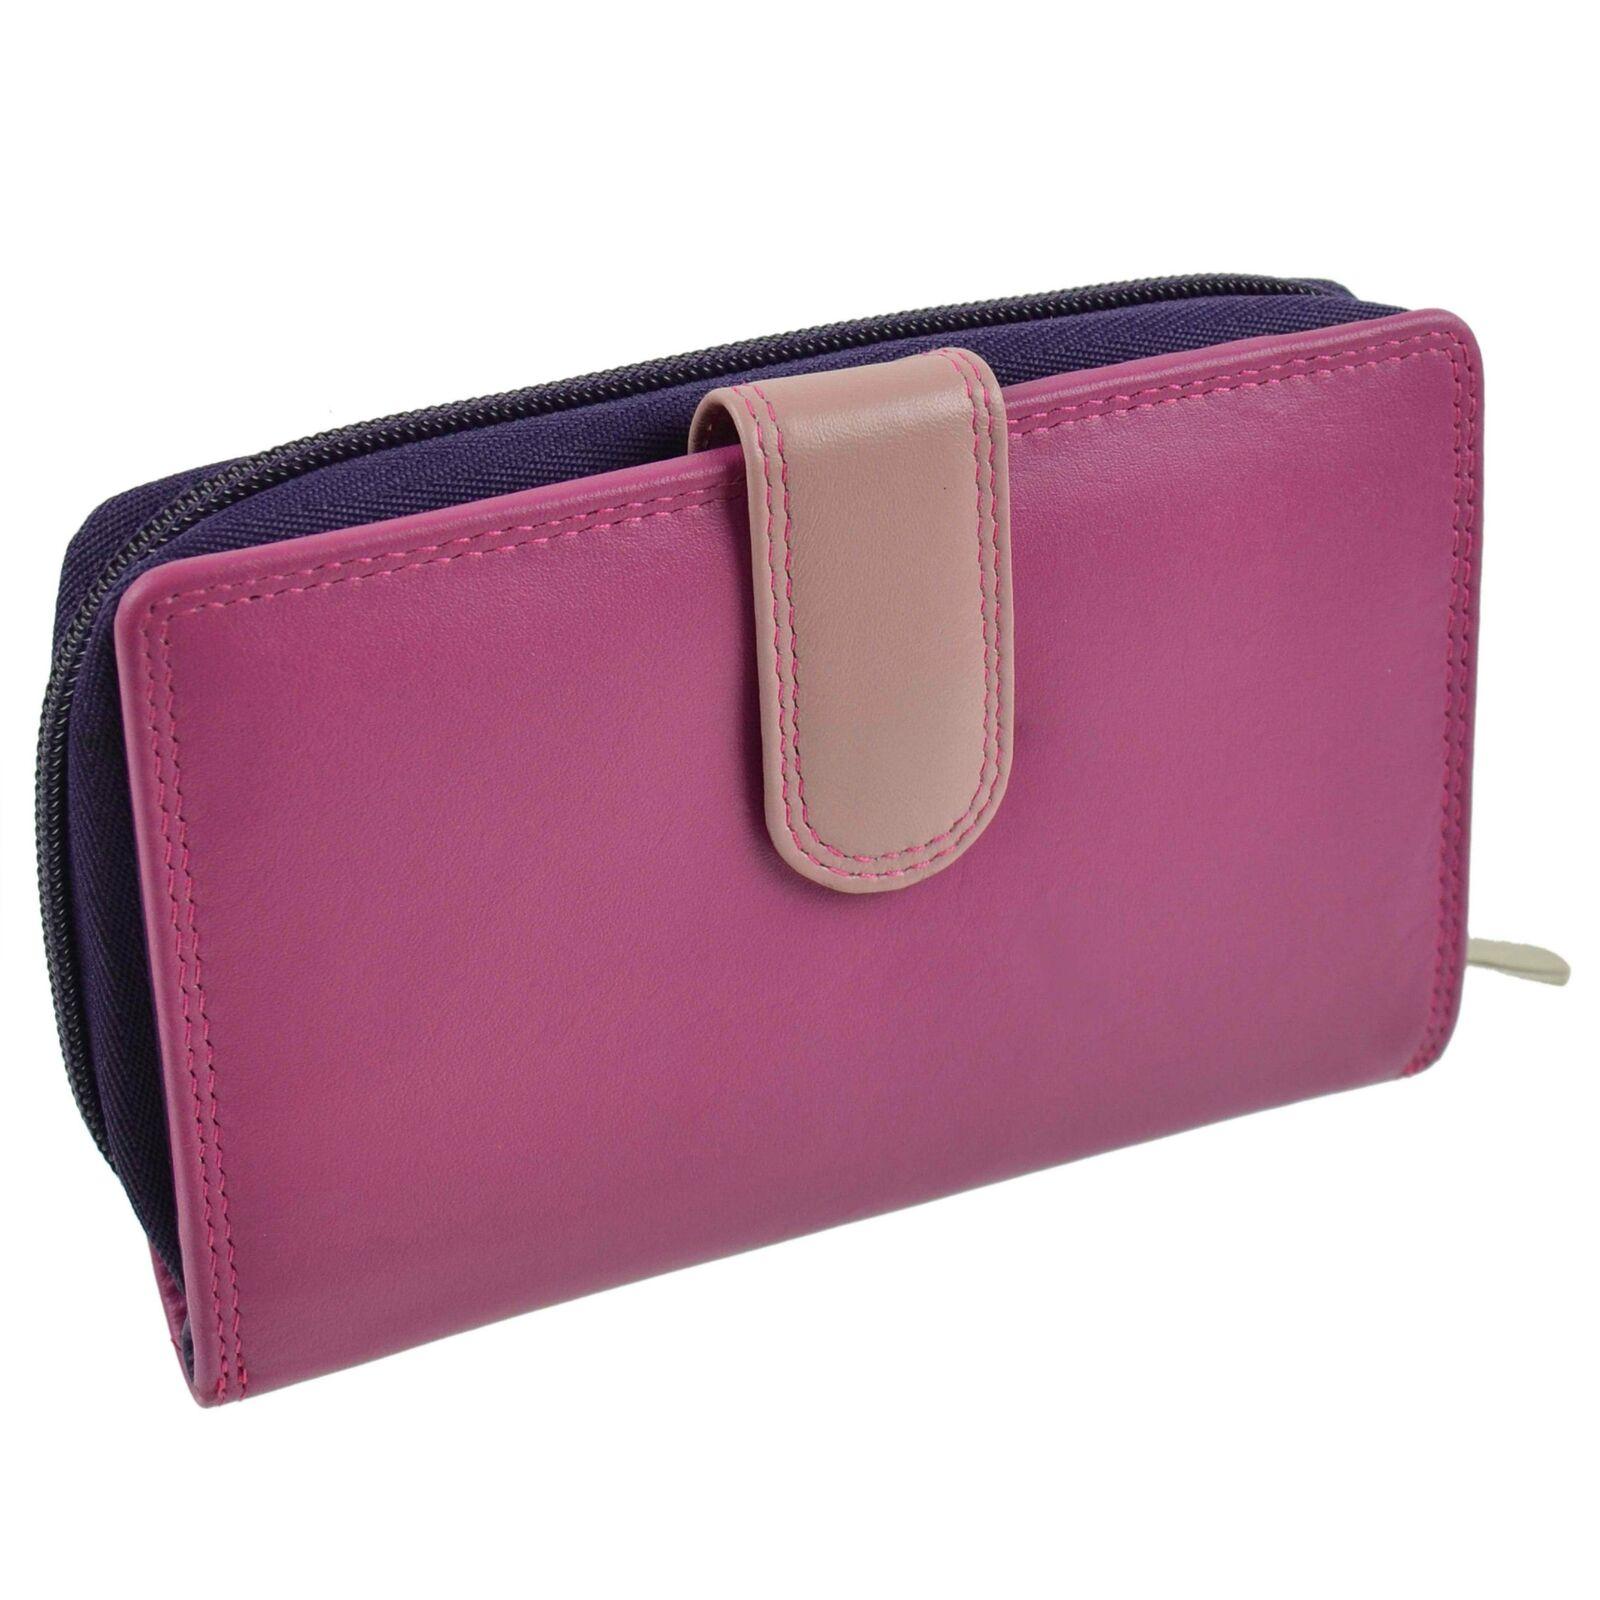 Leather Tabbed Medium Purse/Wallet by Golunski Gift Travel Handy Credit Card